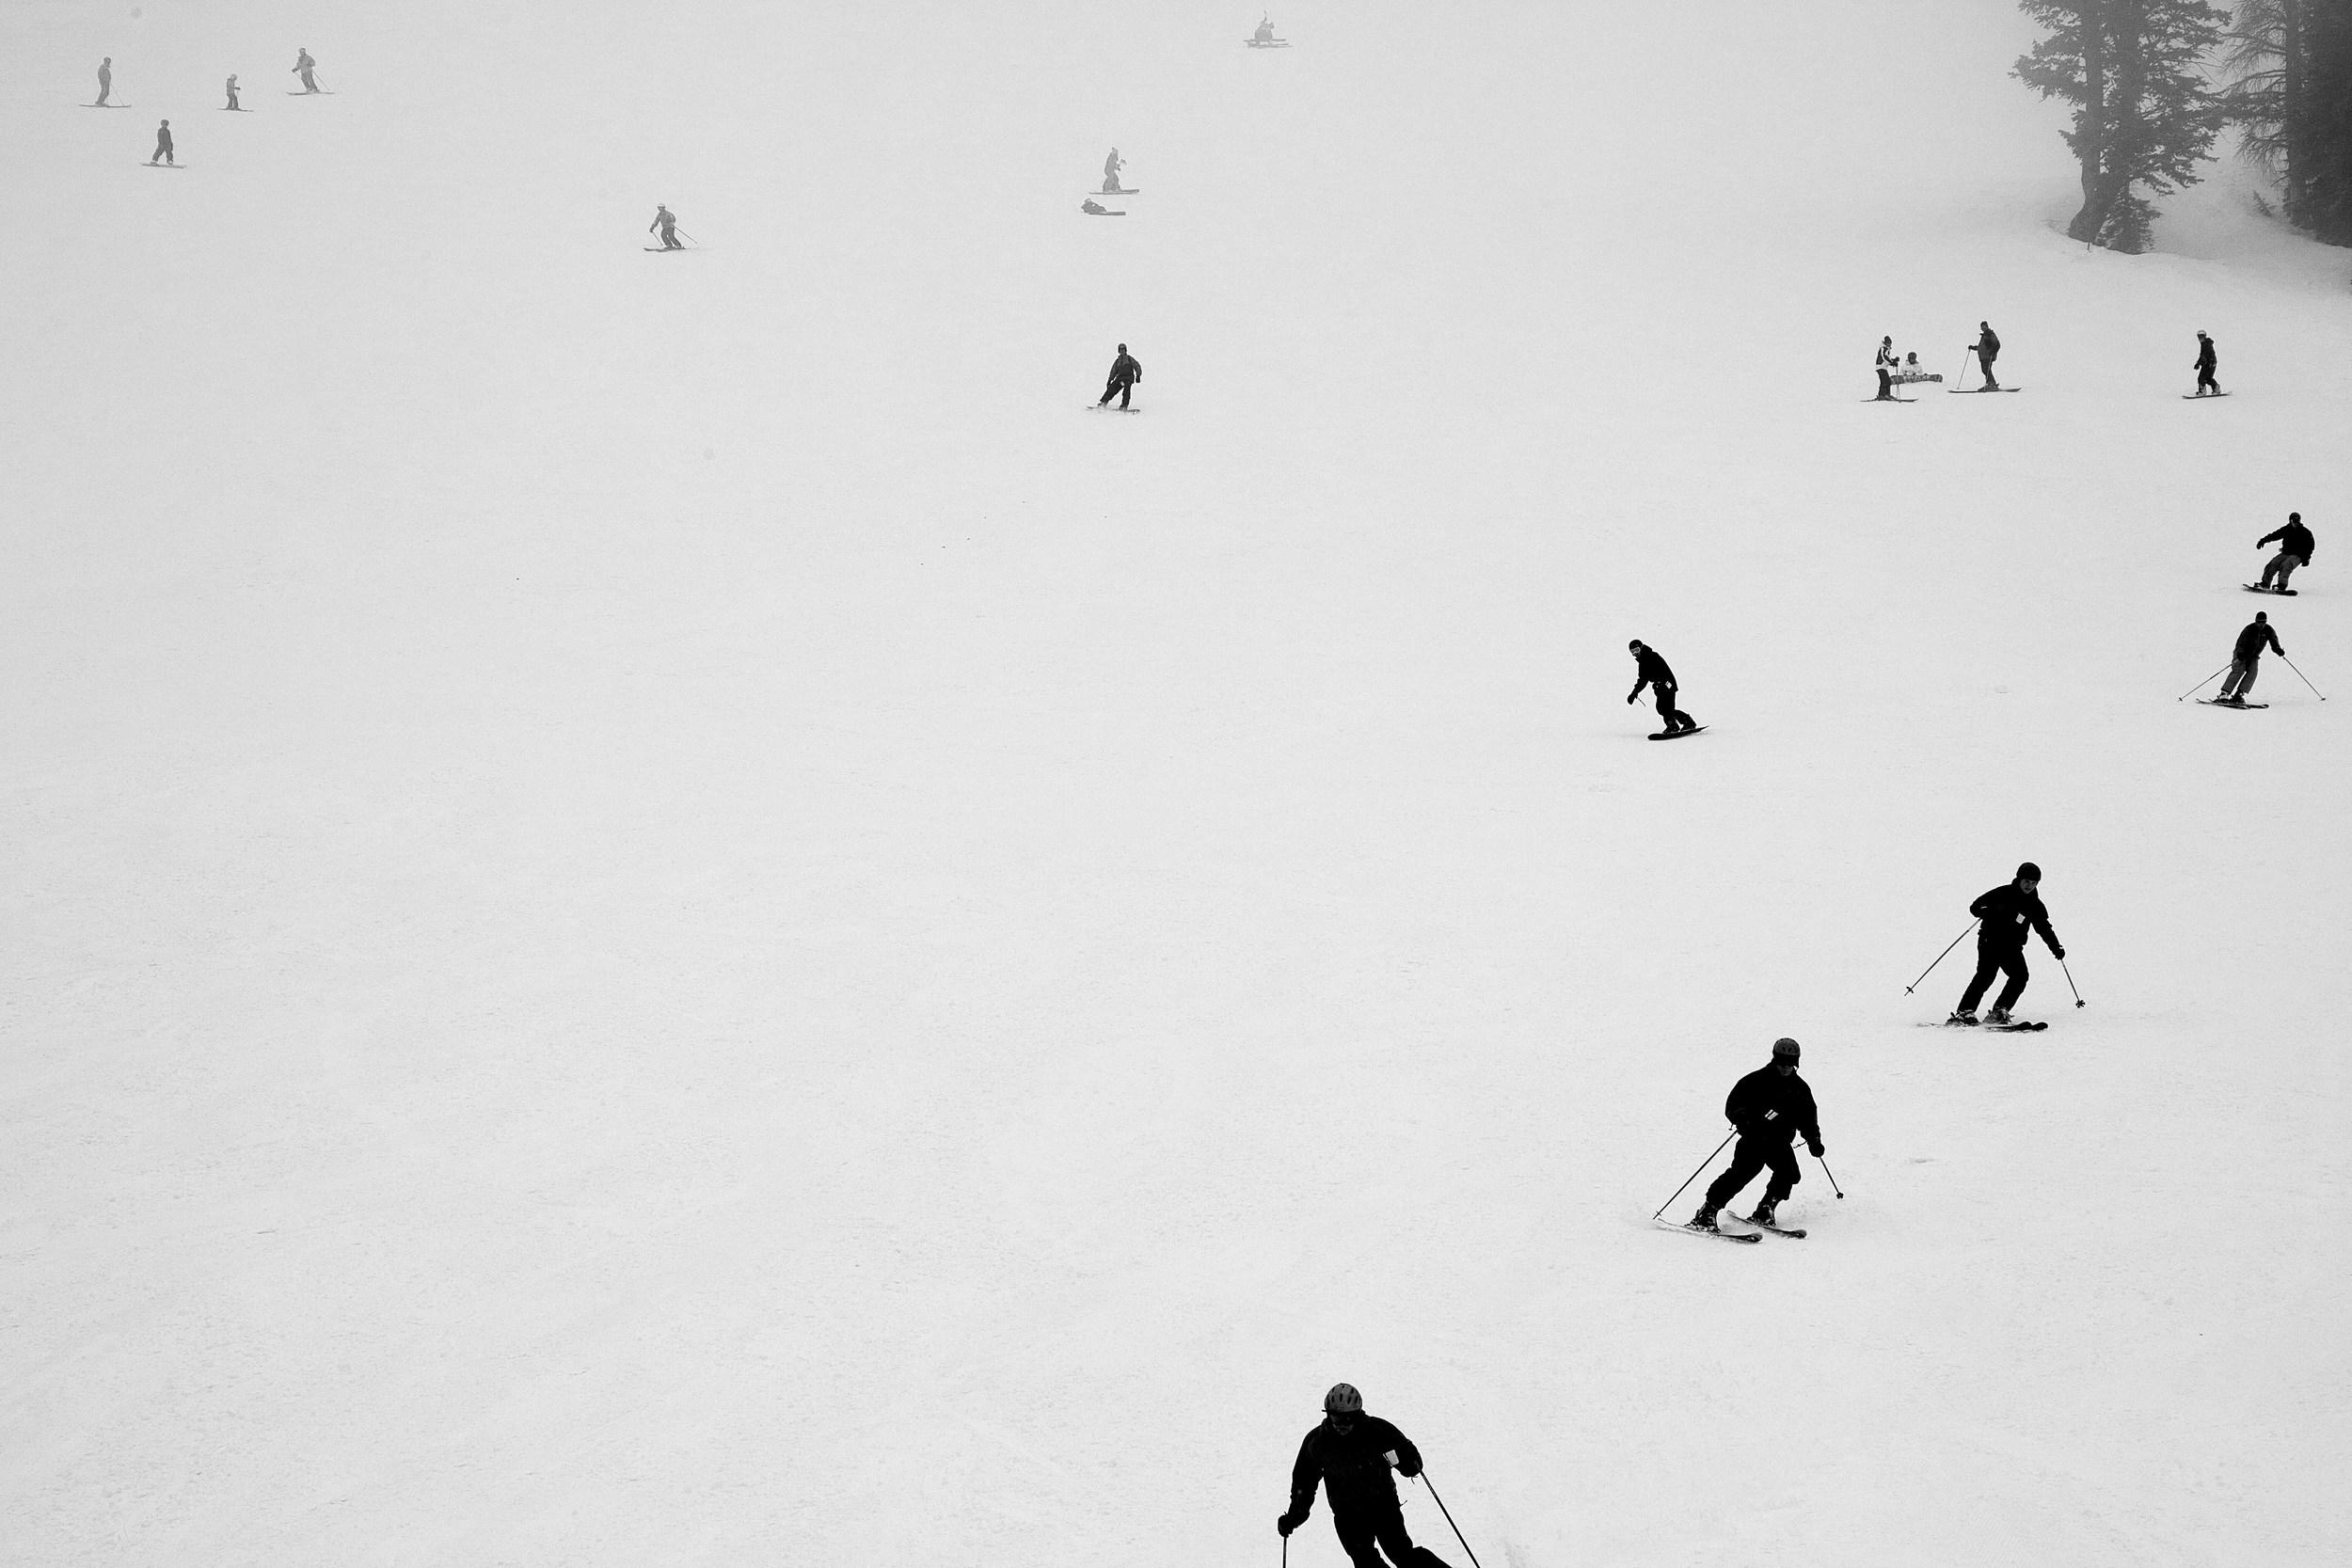 skiing_edit_small.jpg